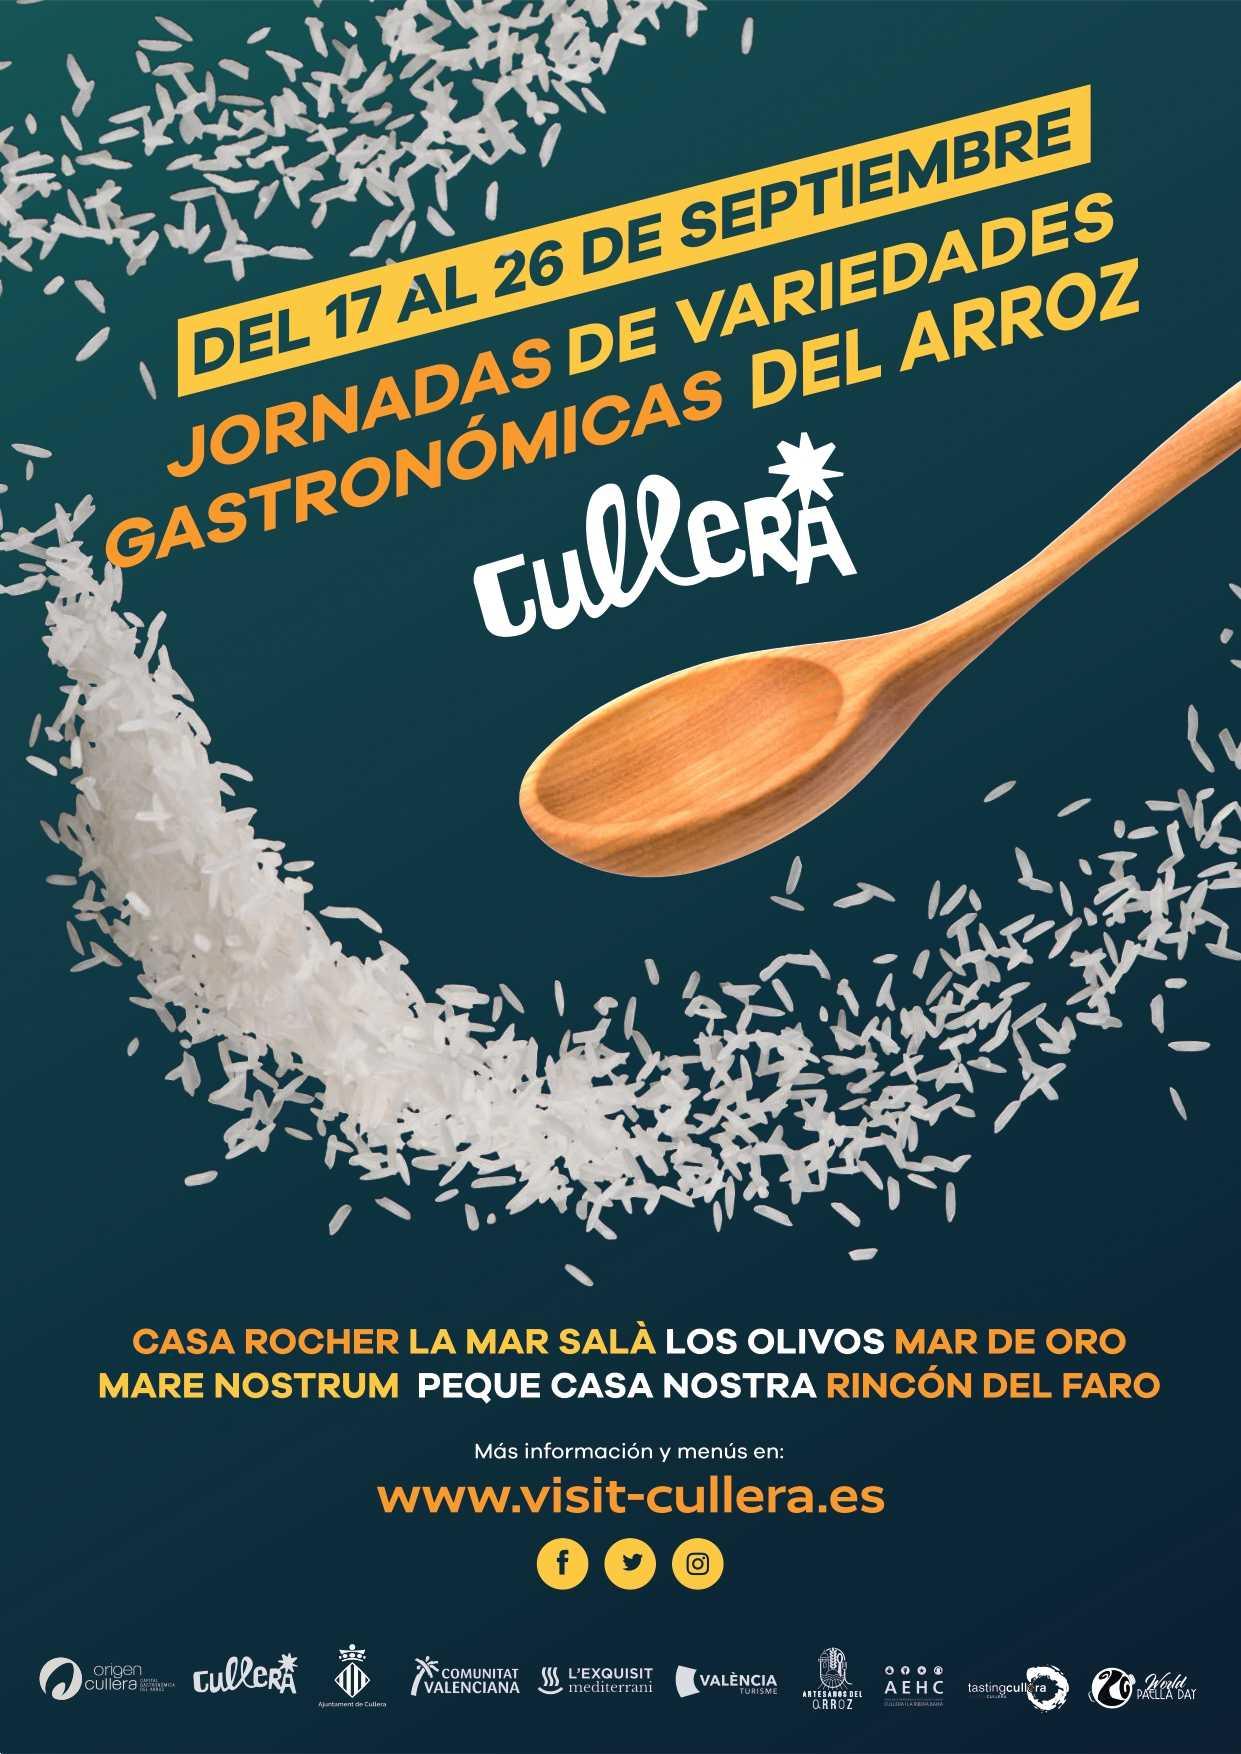 Dastronomic Days of Rice in Cullera